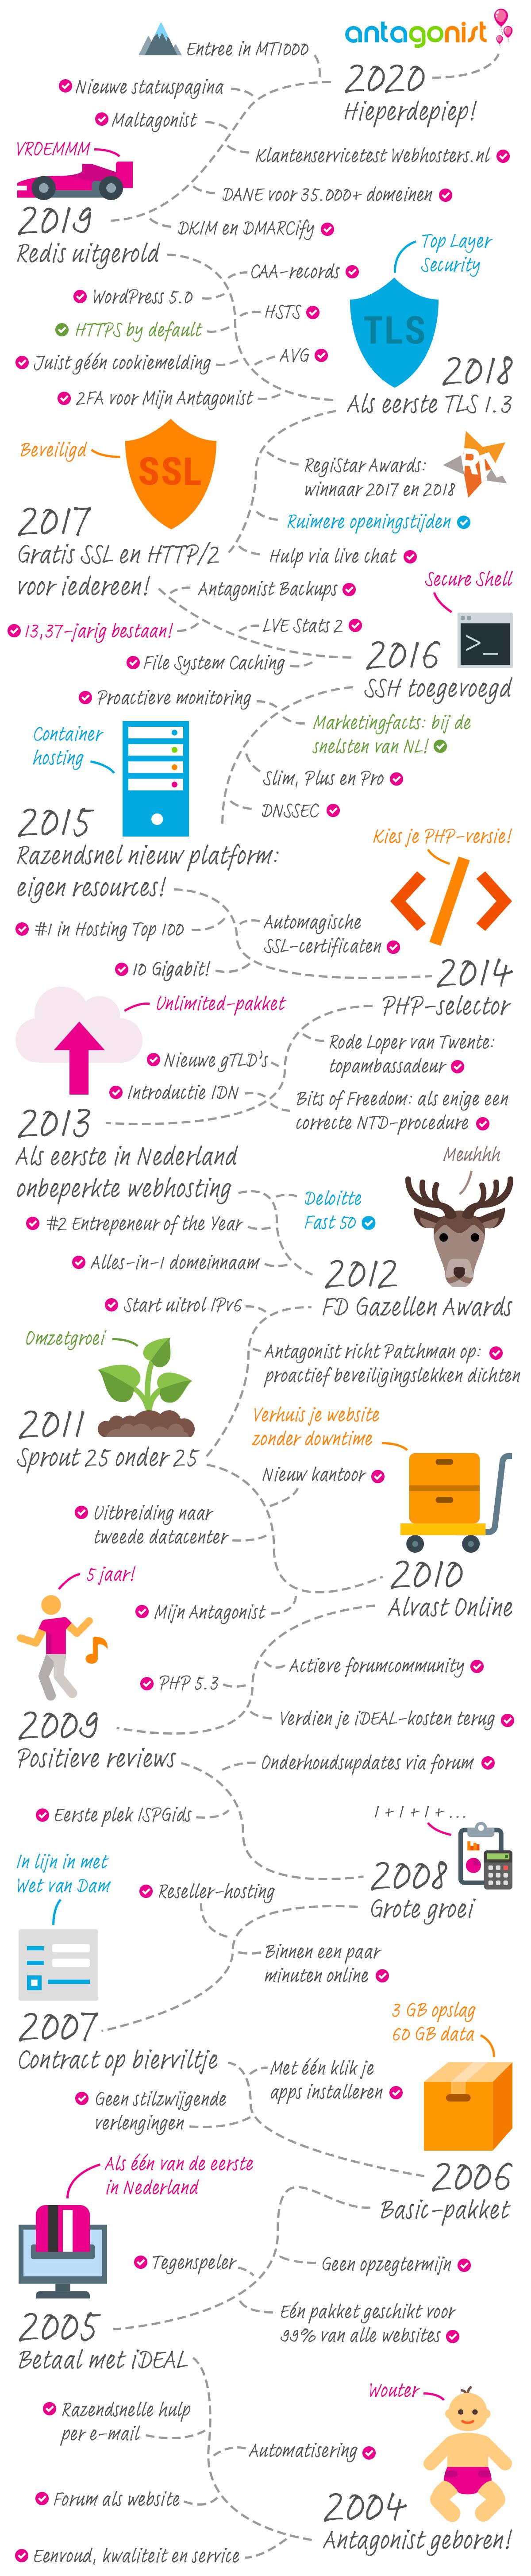 Infographic: Antagonist 15 jaar vooruitgang.